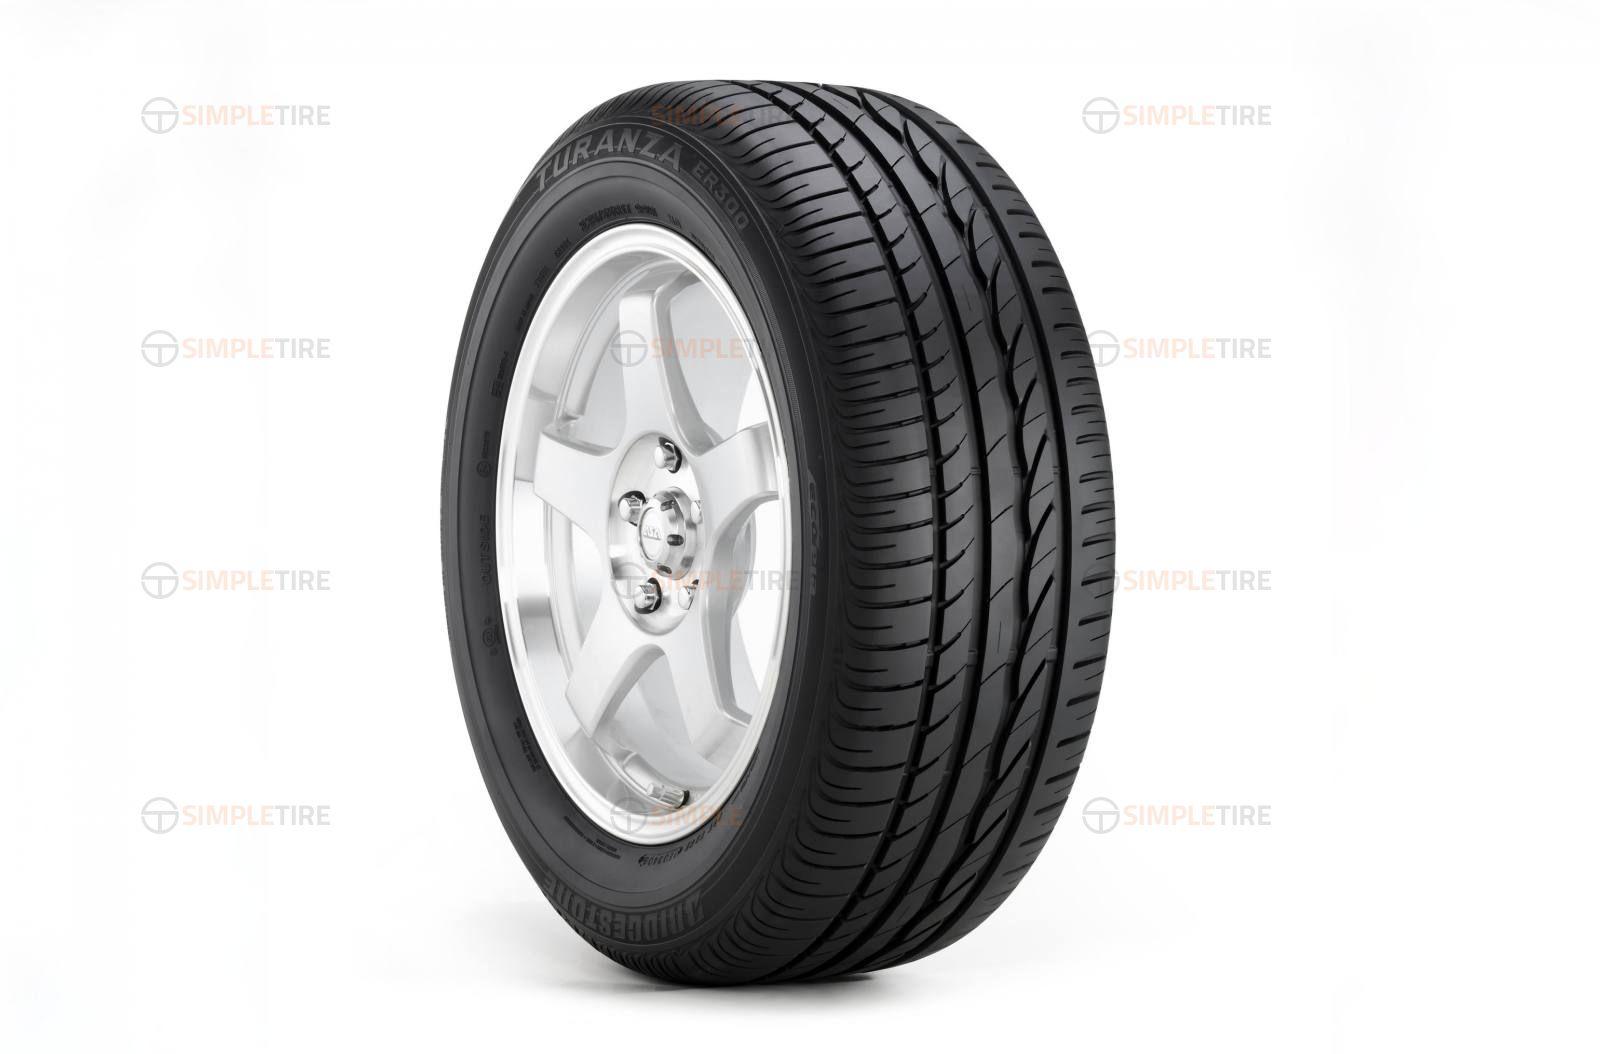 Bridgestone Tempa Spare TR2 145/70R-17 23965